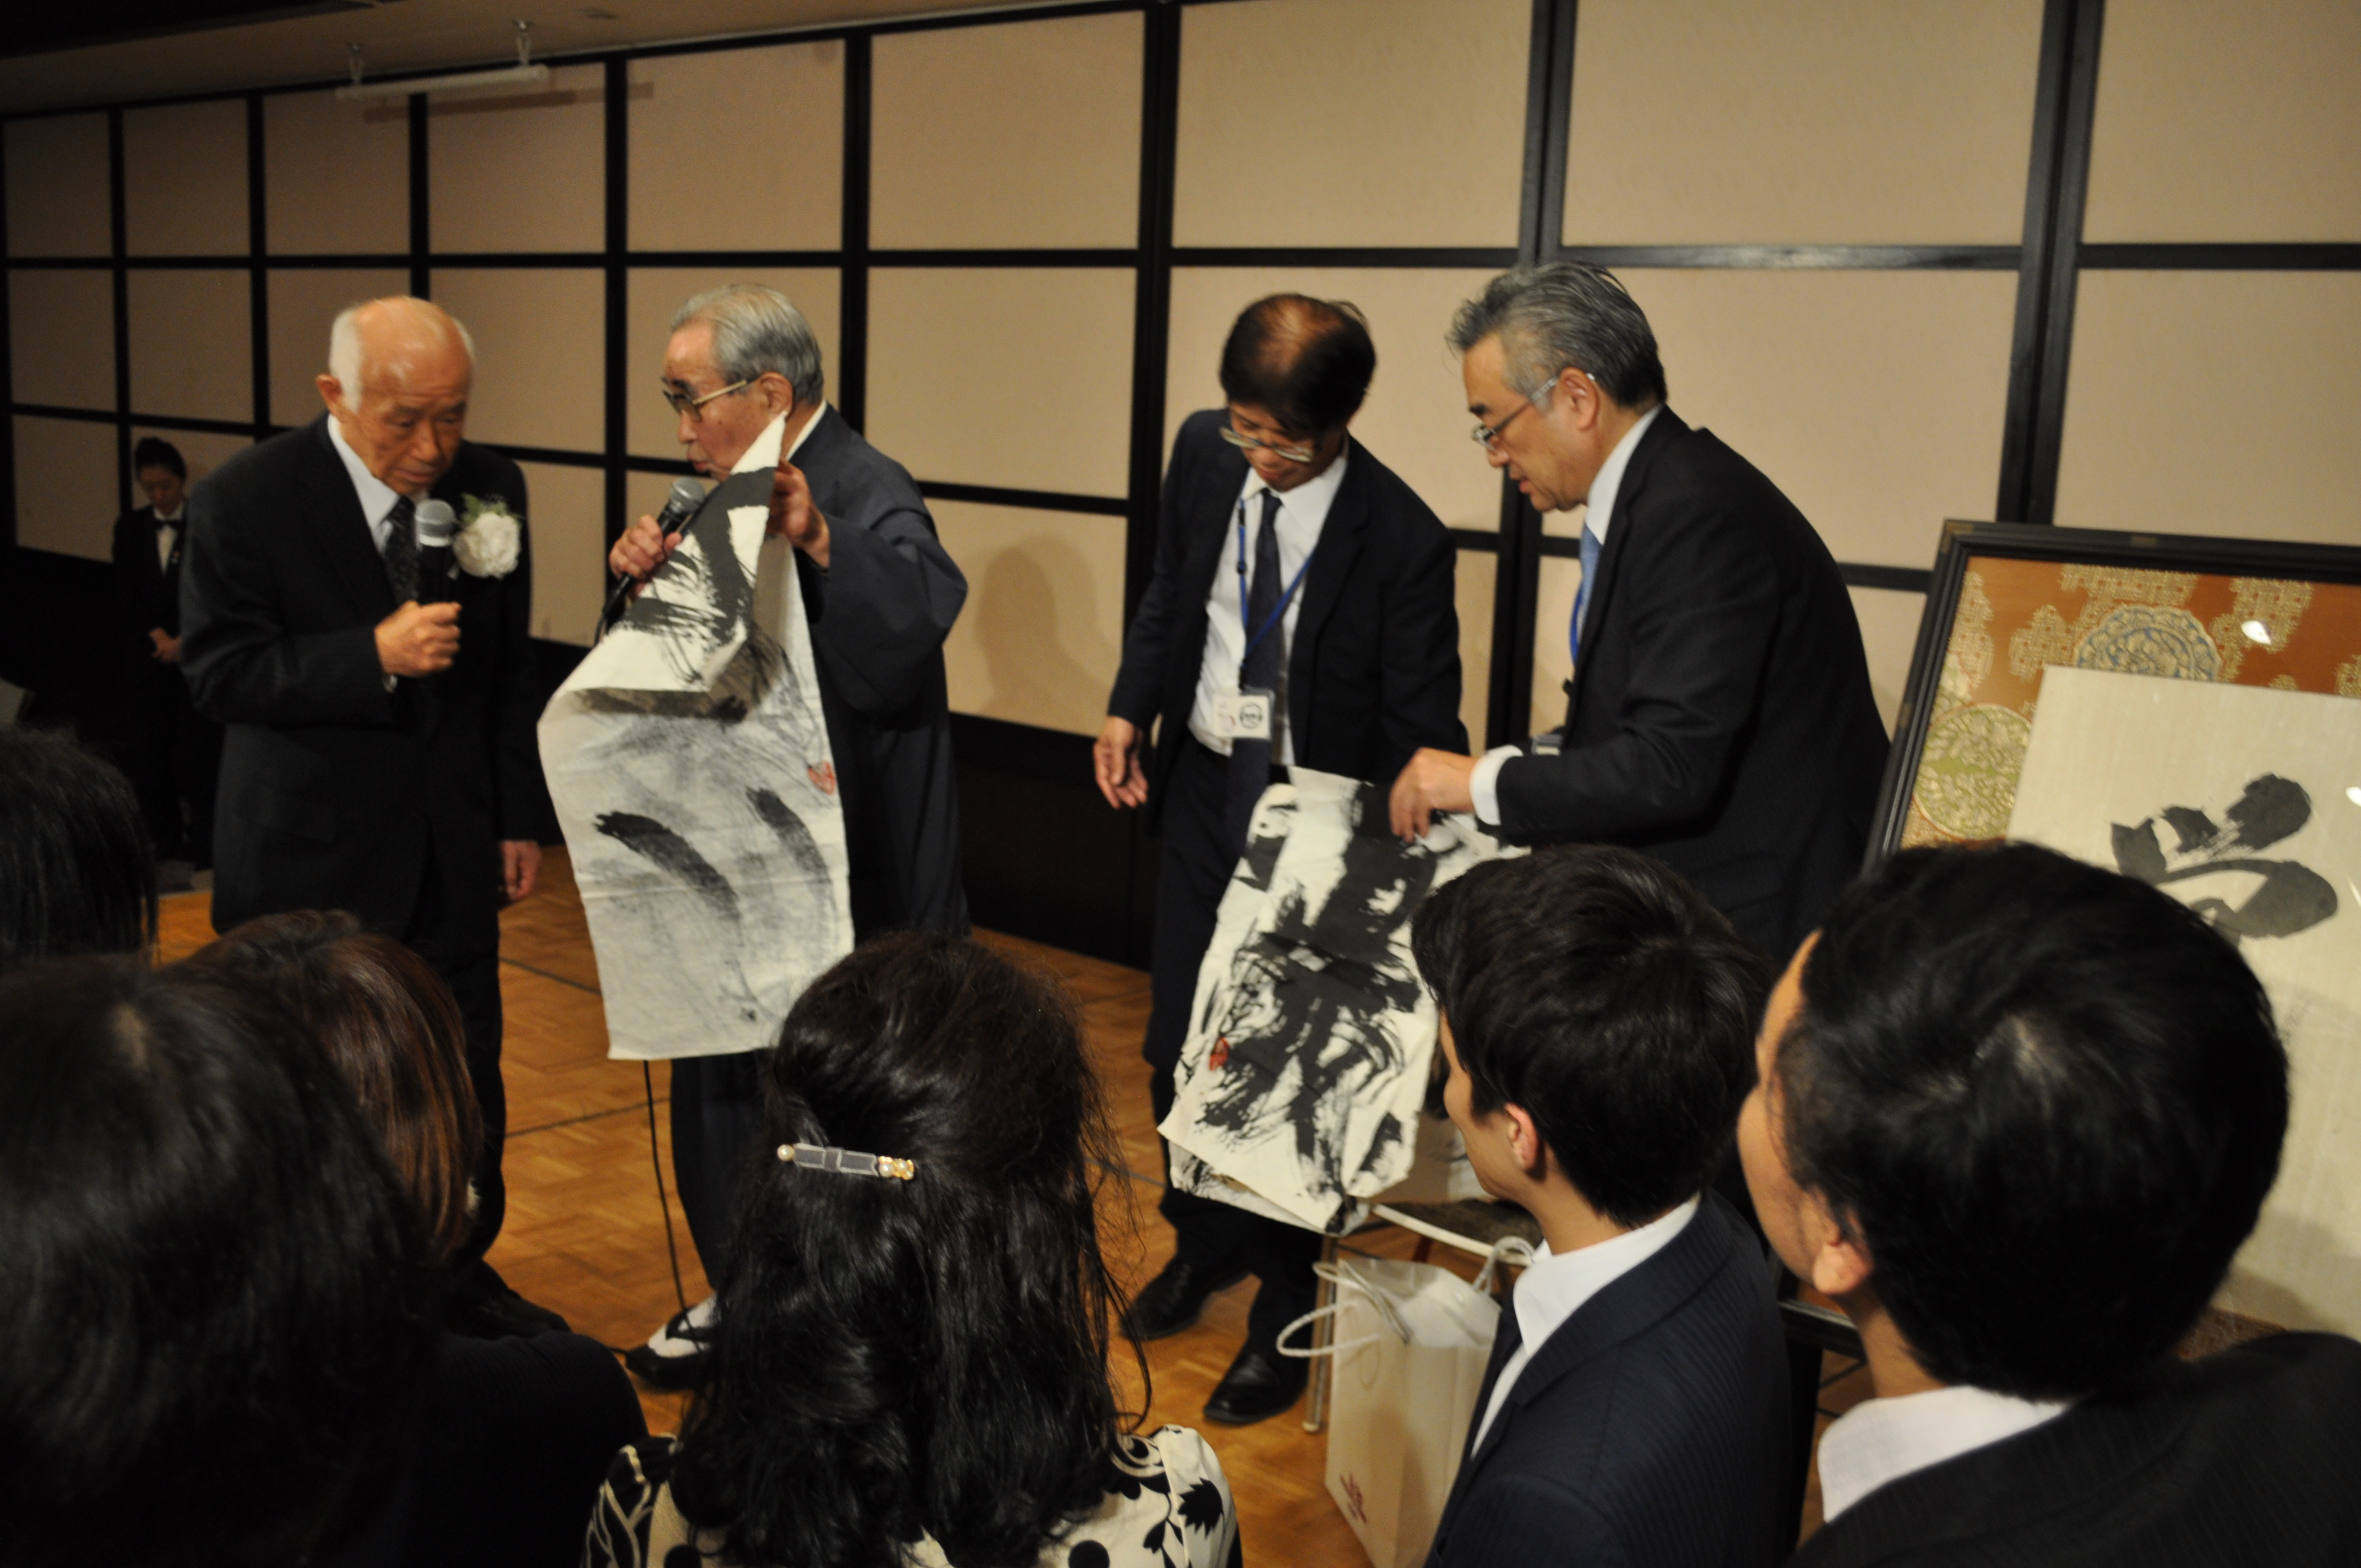 DSC 0579 - 第6回思風会全国大会2018in東京開催